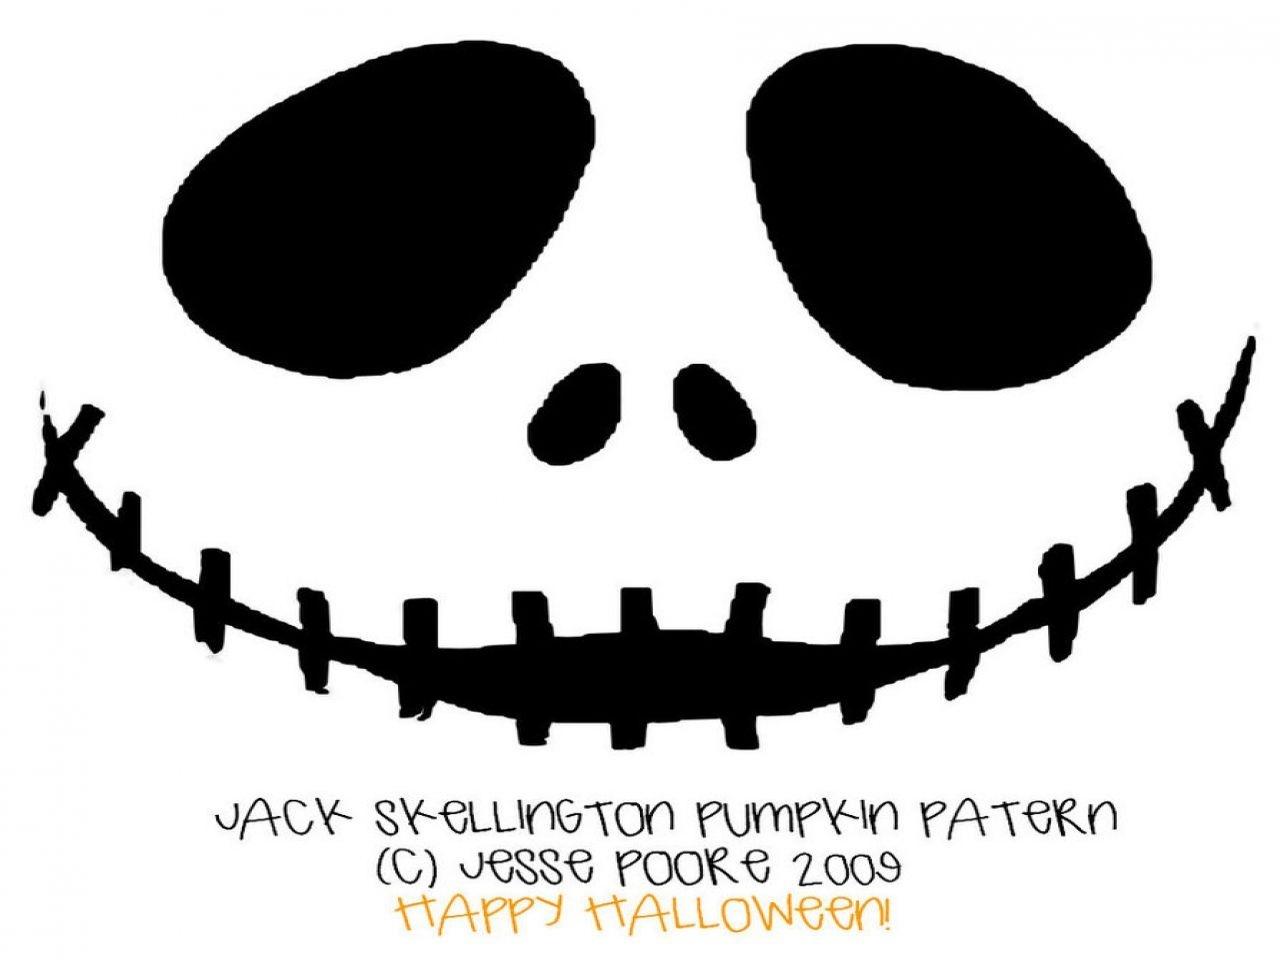 Free Printable Jack Skellington Pumpkin Carving Stencil Templates - Jack Skellington And Sally Pumpkin Stencils Free Printable